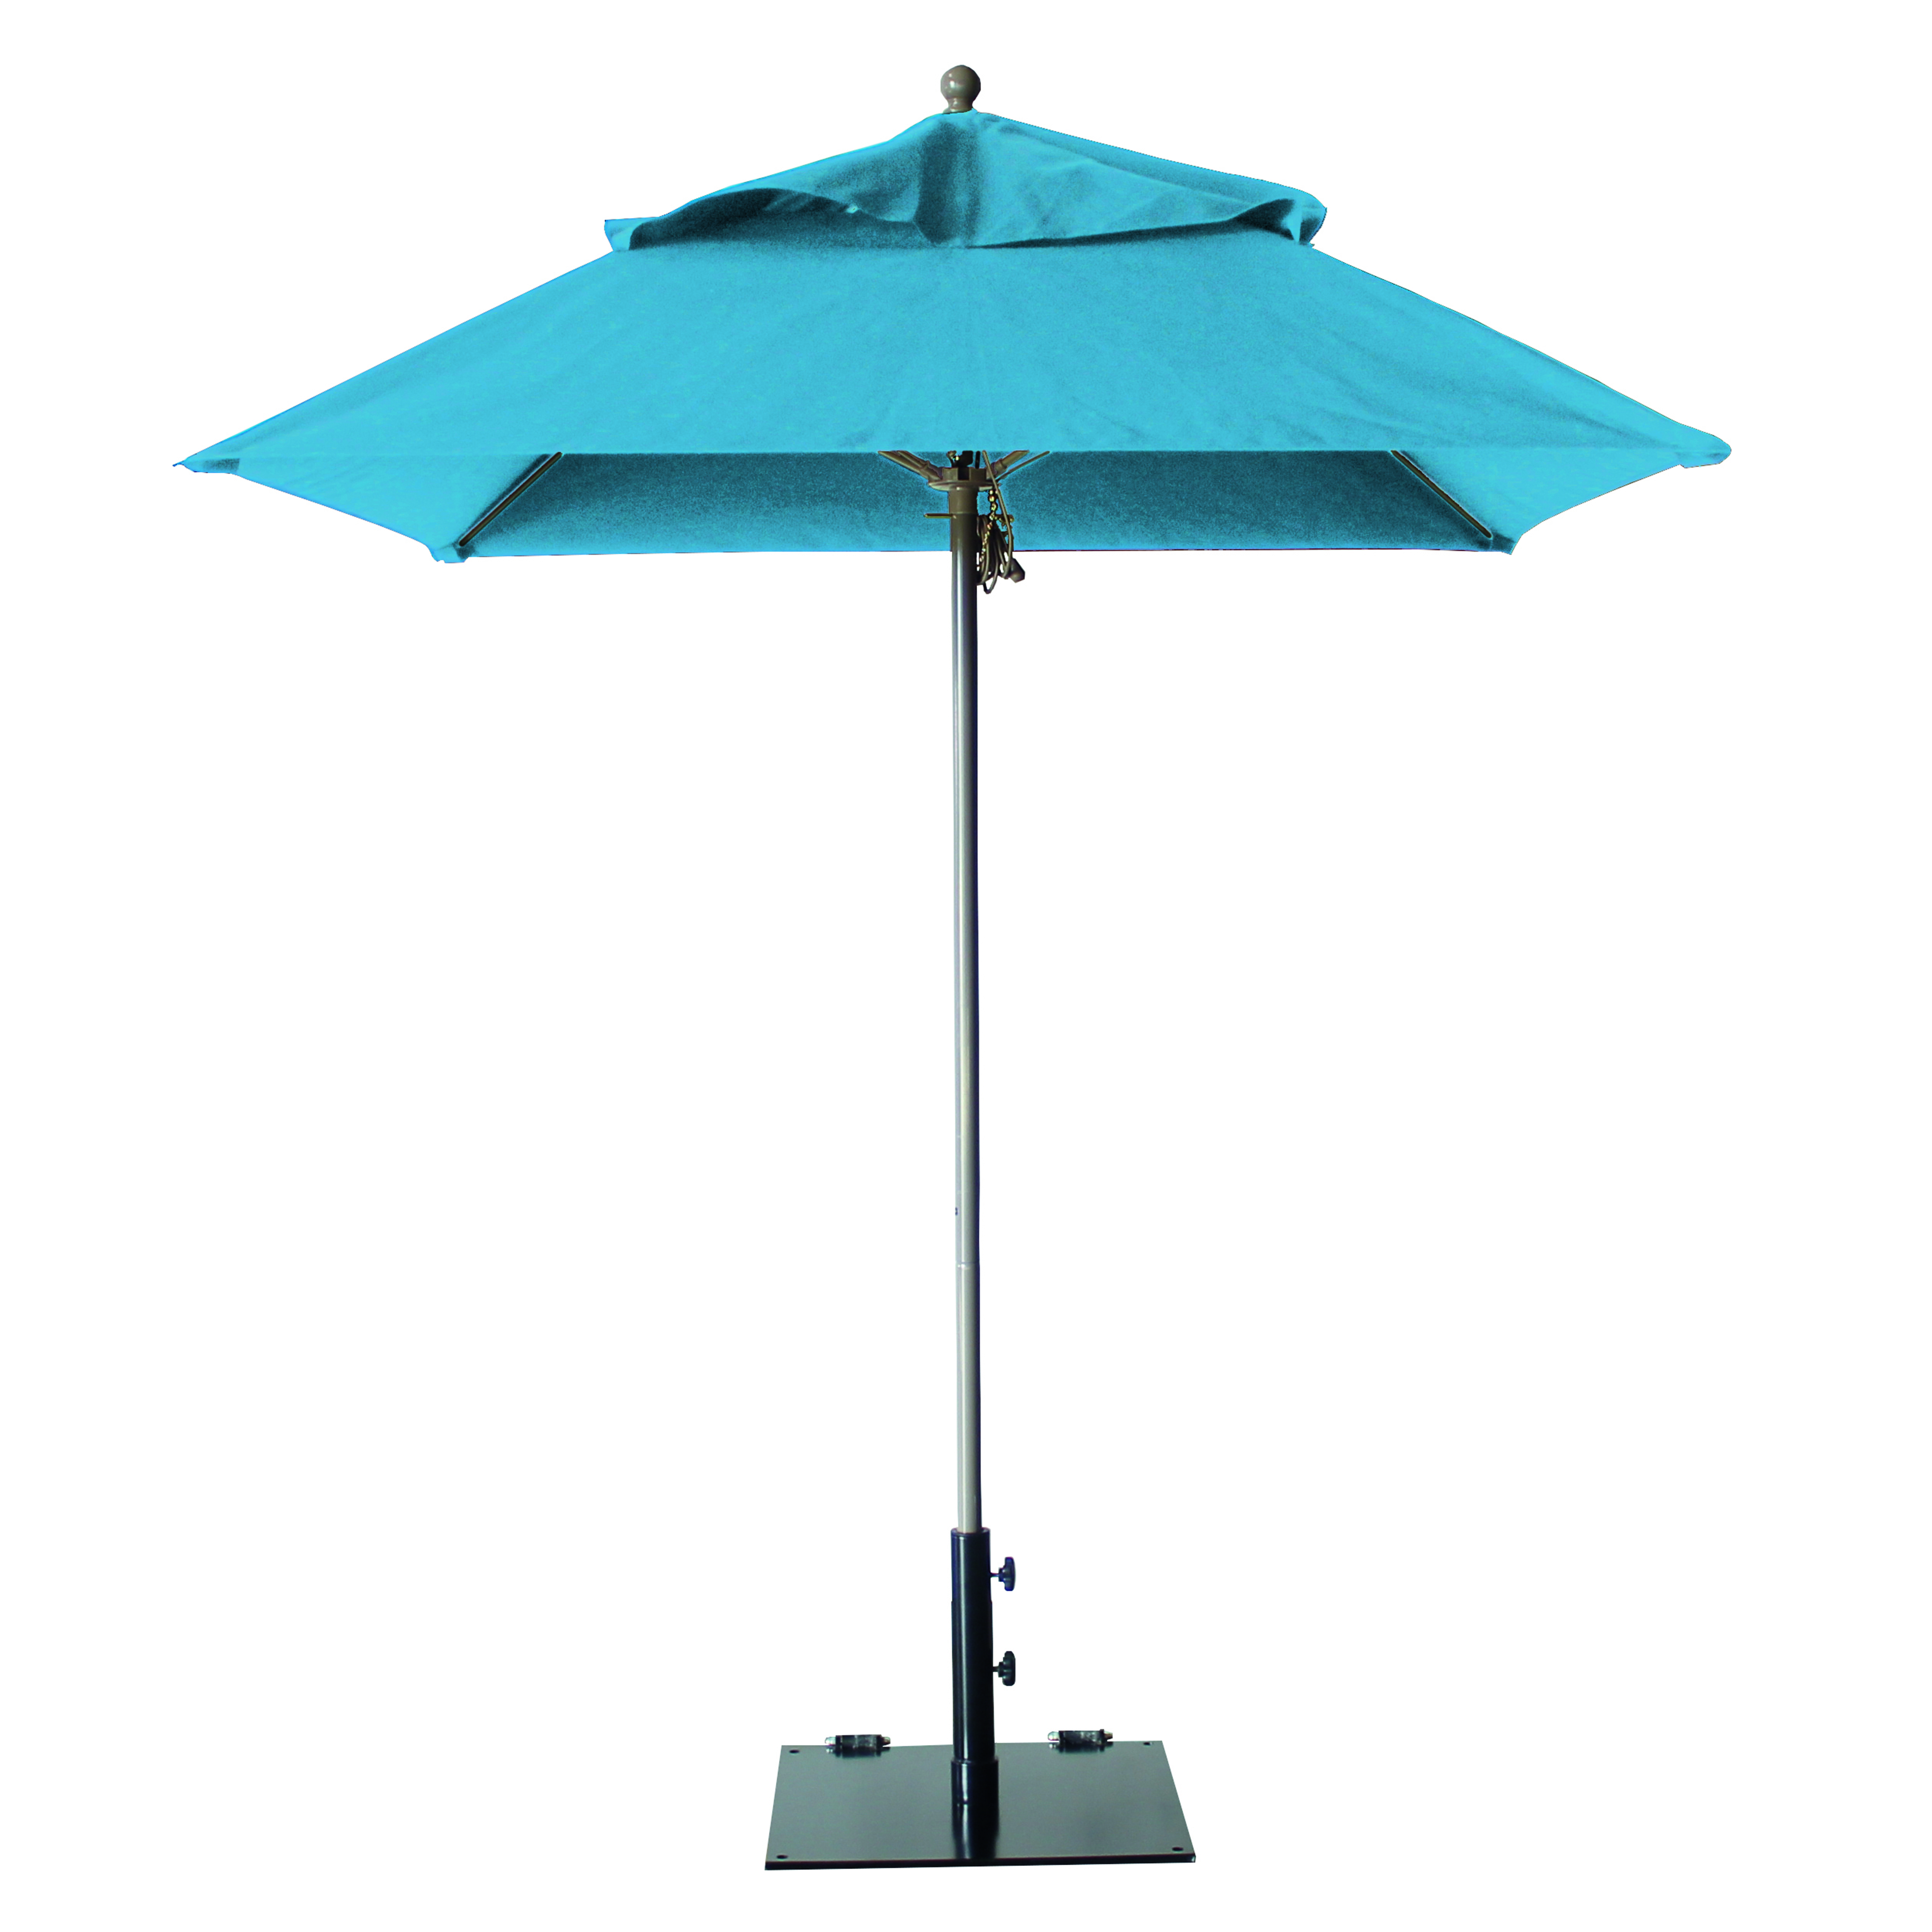 Grosfillex 98669431 umbrella